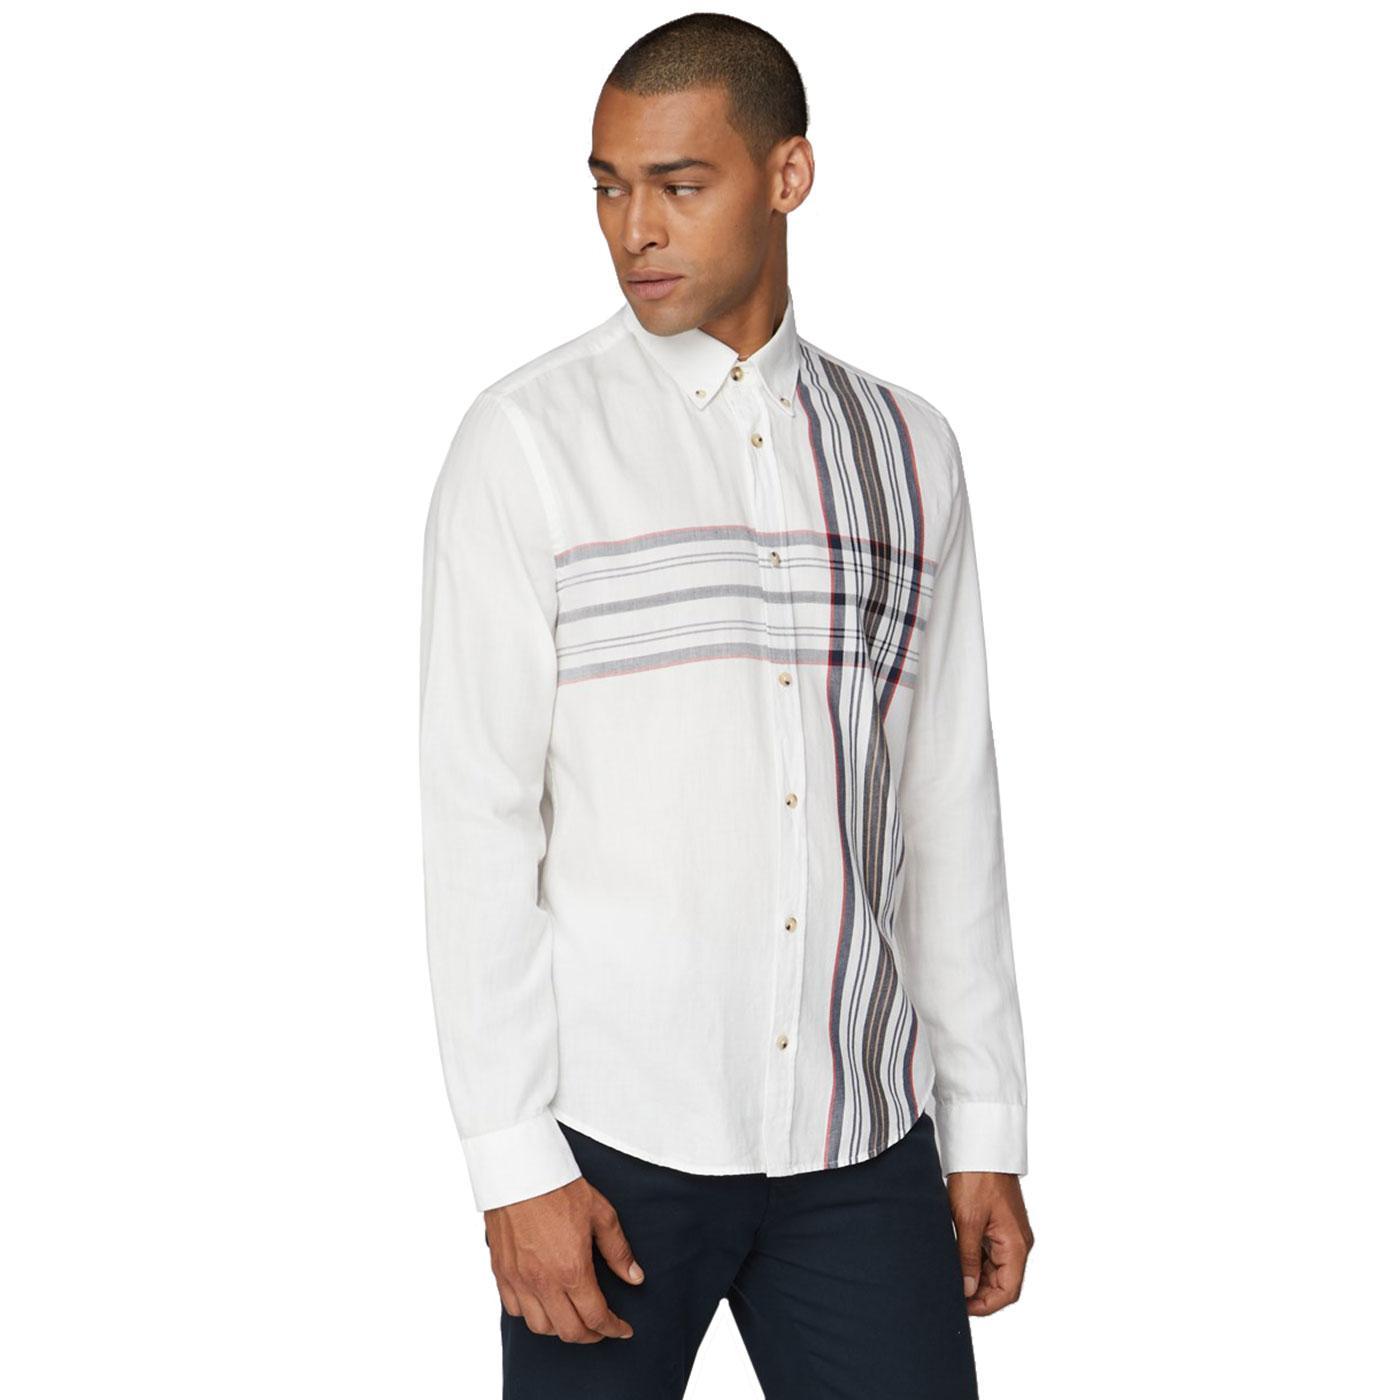 BEN SHERMAN Men's Retro Placed Stripe Plaid Shirt